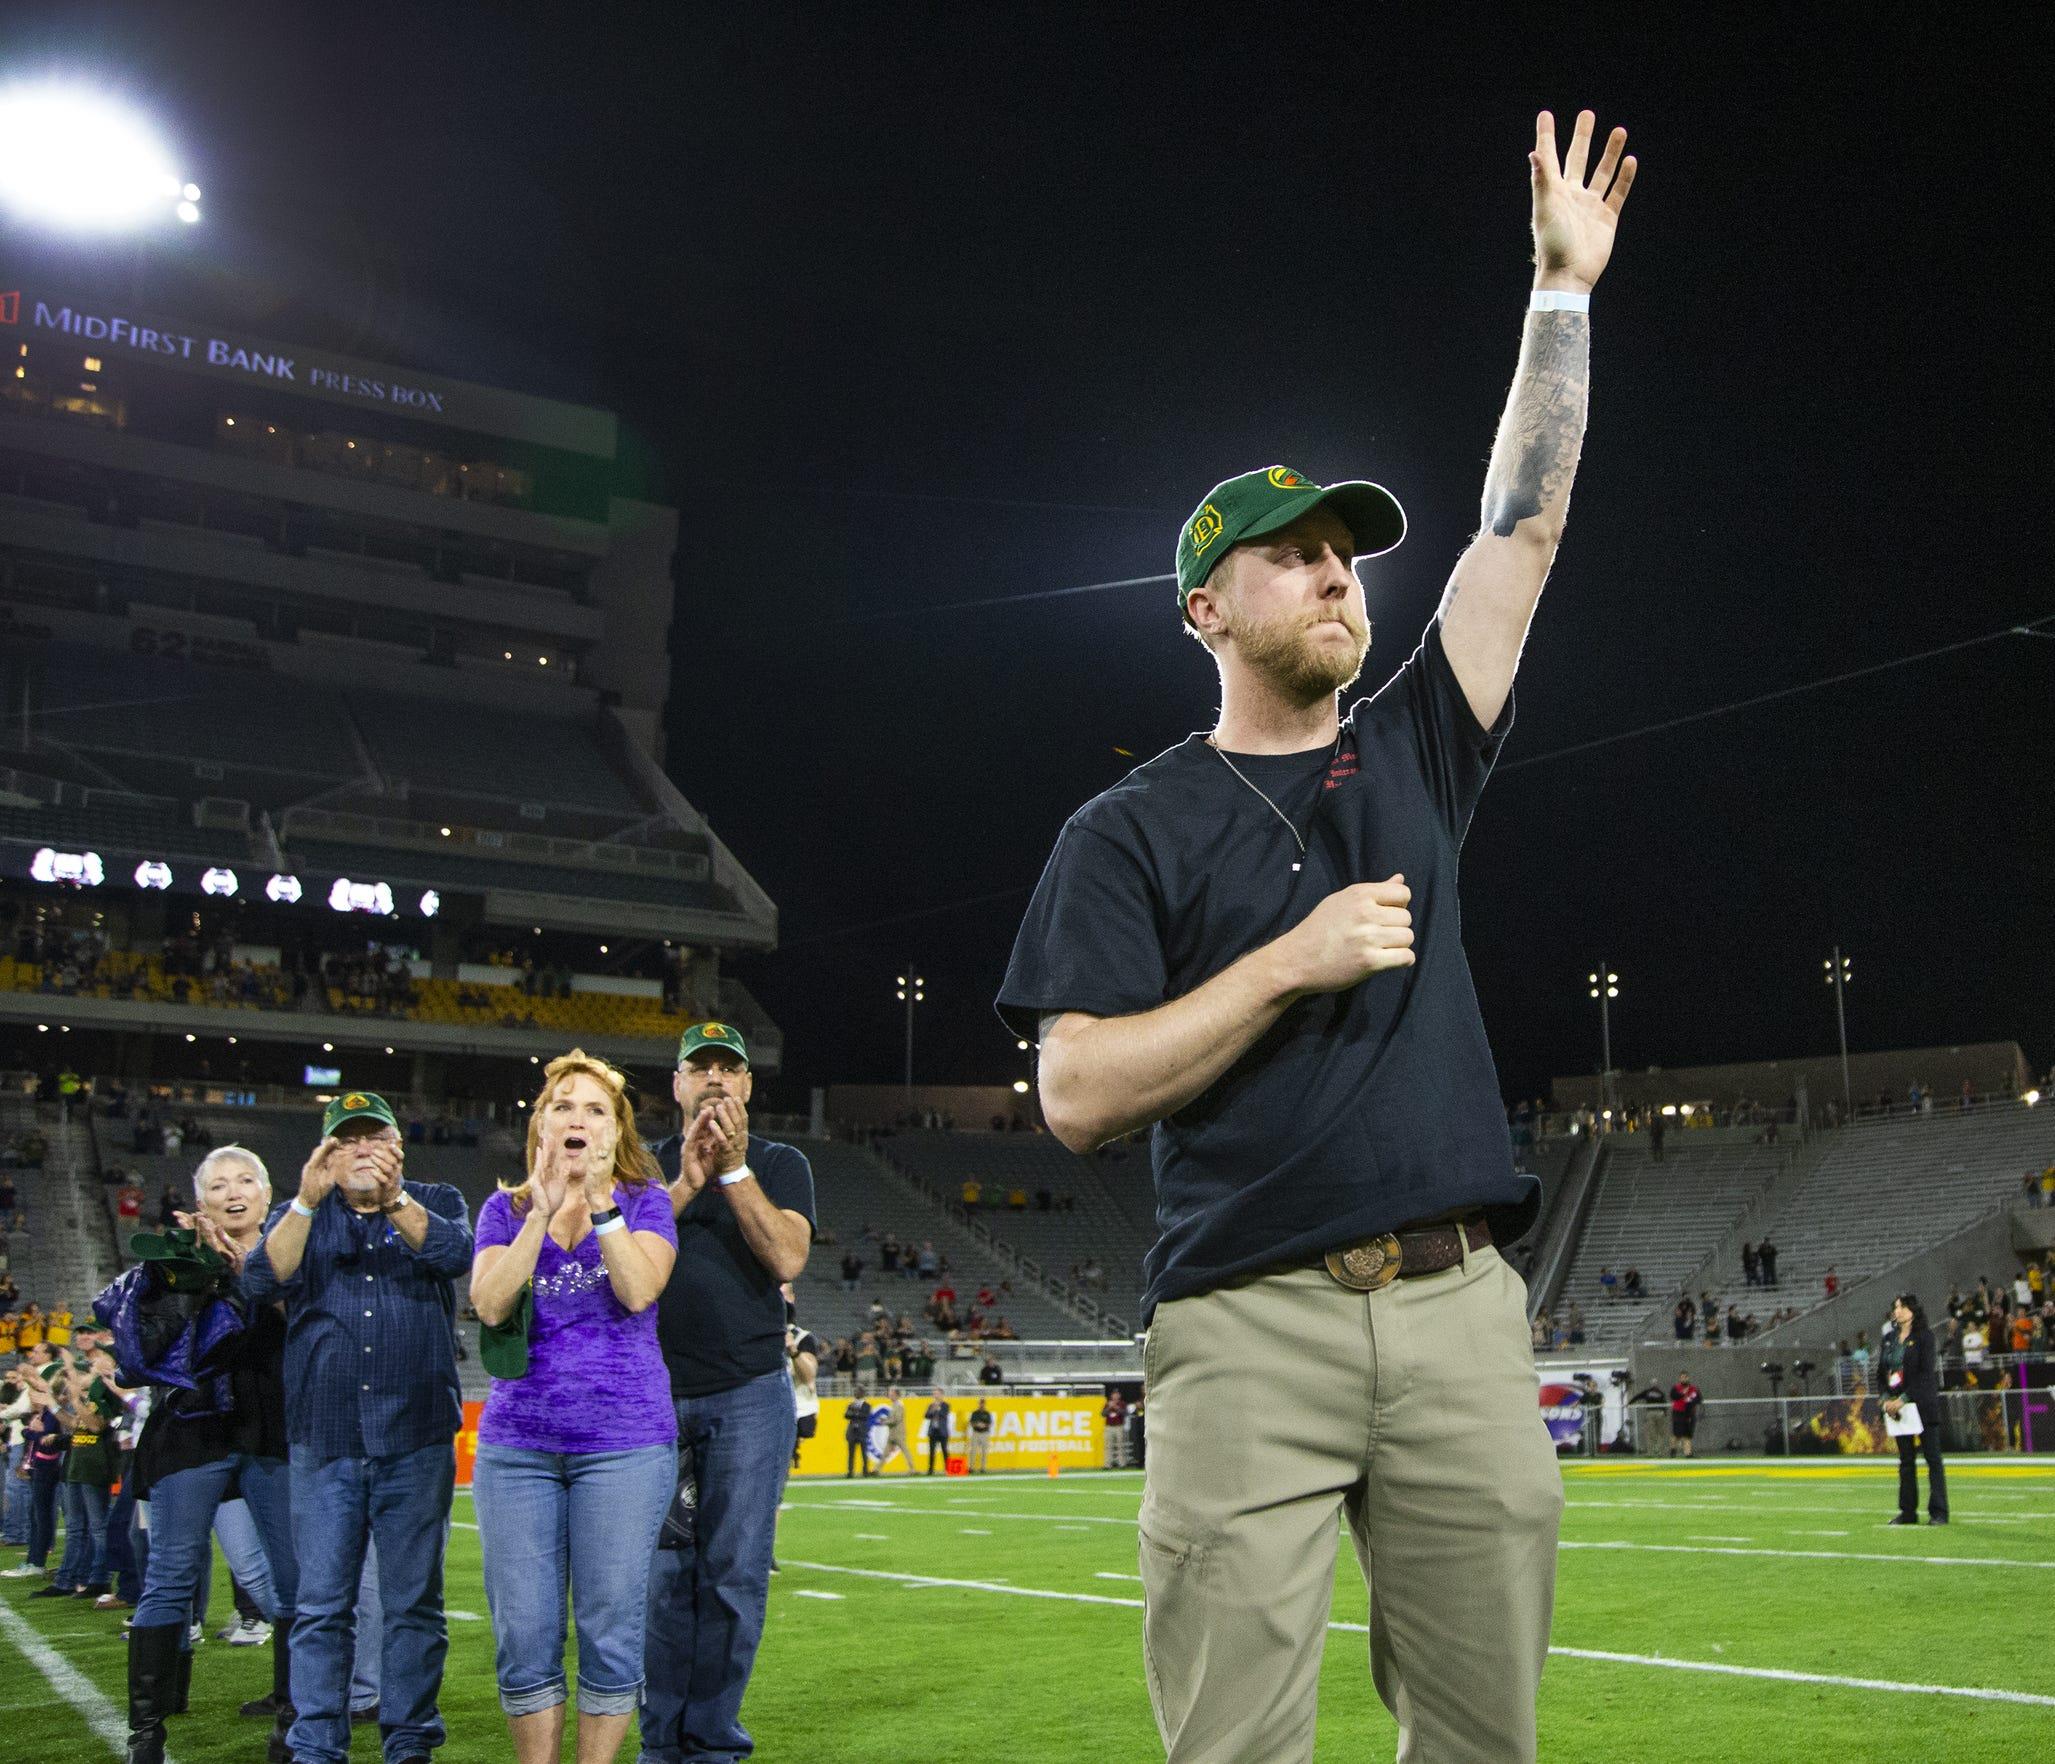 Brendan McDonough, the lone-surviving member of the Granite Mountain Hotshots, waves to the Arizona Hotshots crowd.